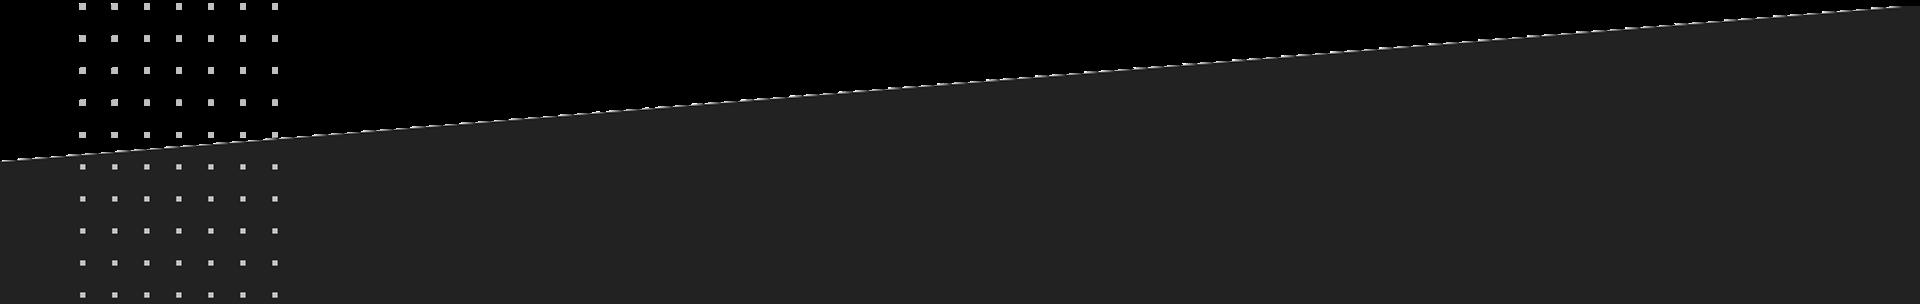 4sight-curve-dark-1